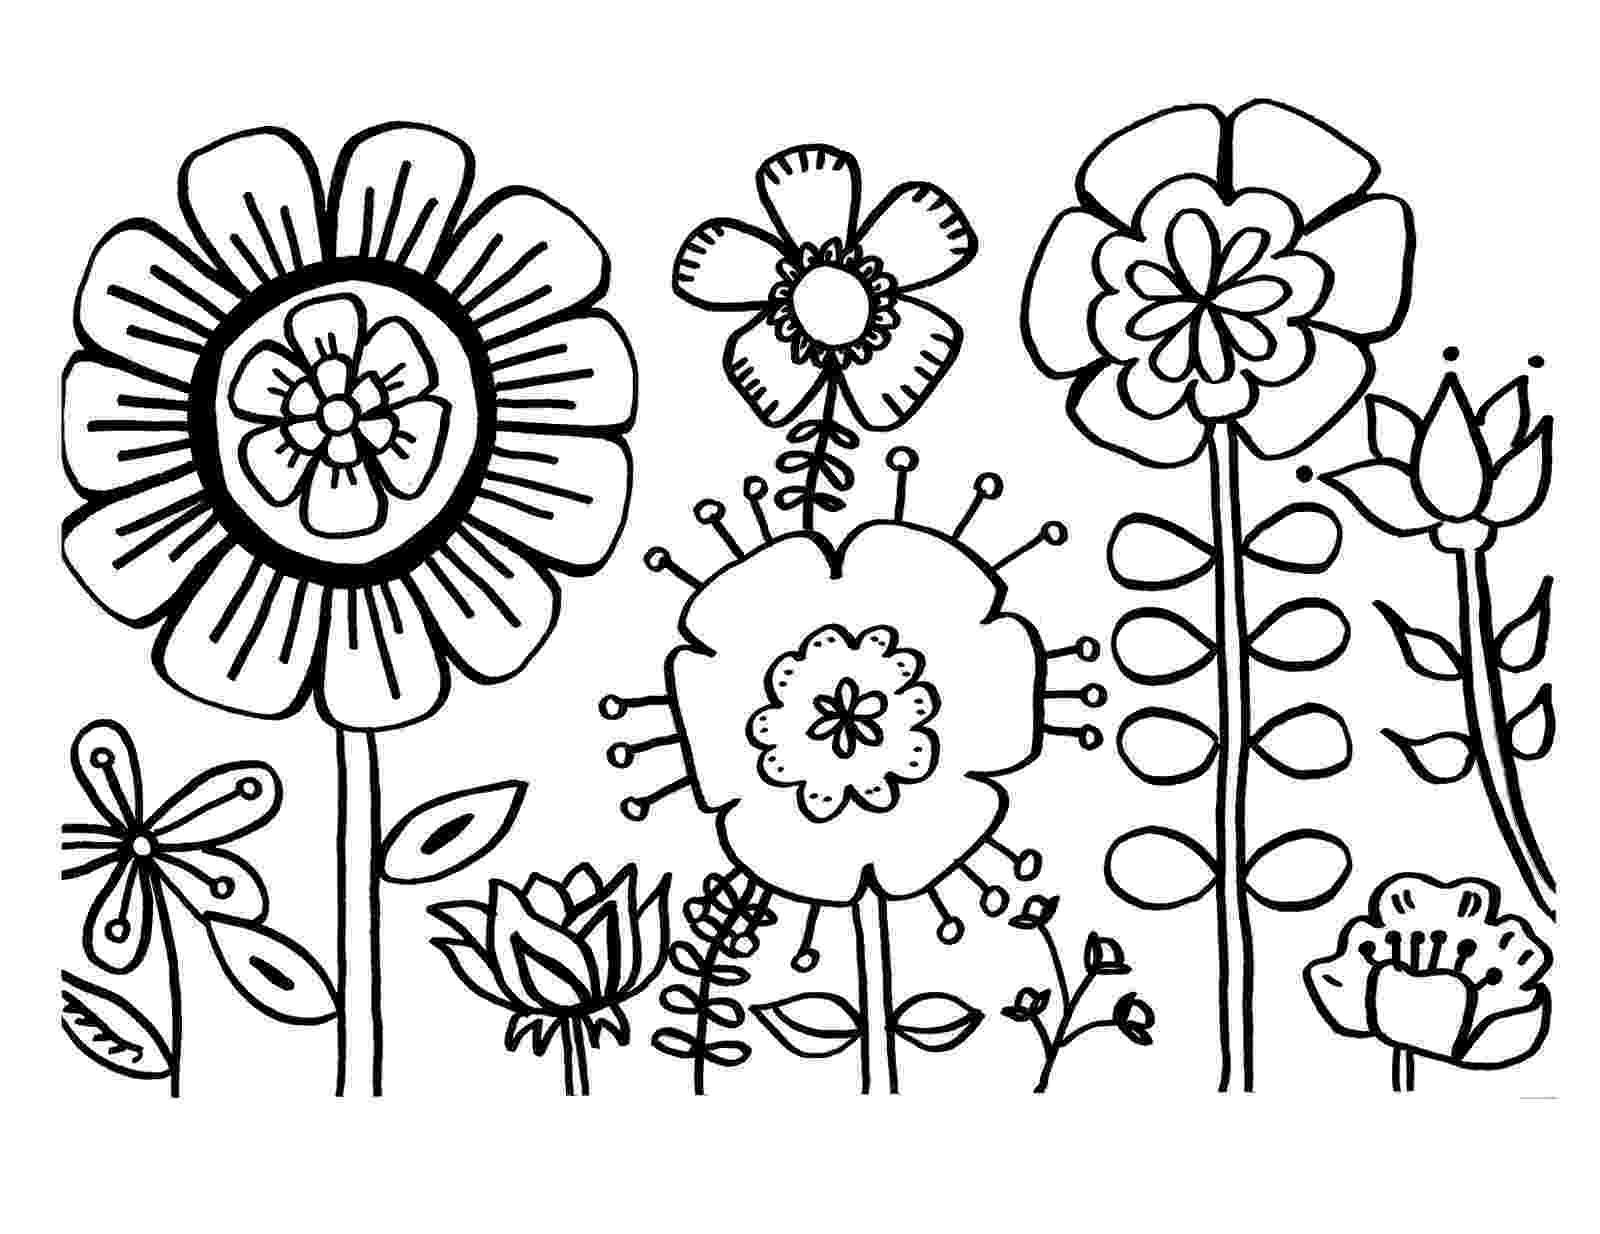 flower coloring book free printable flower coloring pages for kids best flower coloring book 1 1